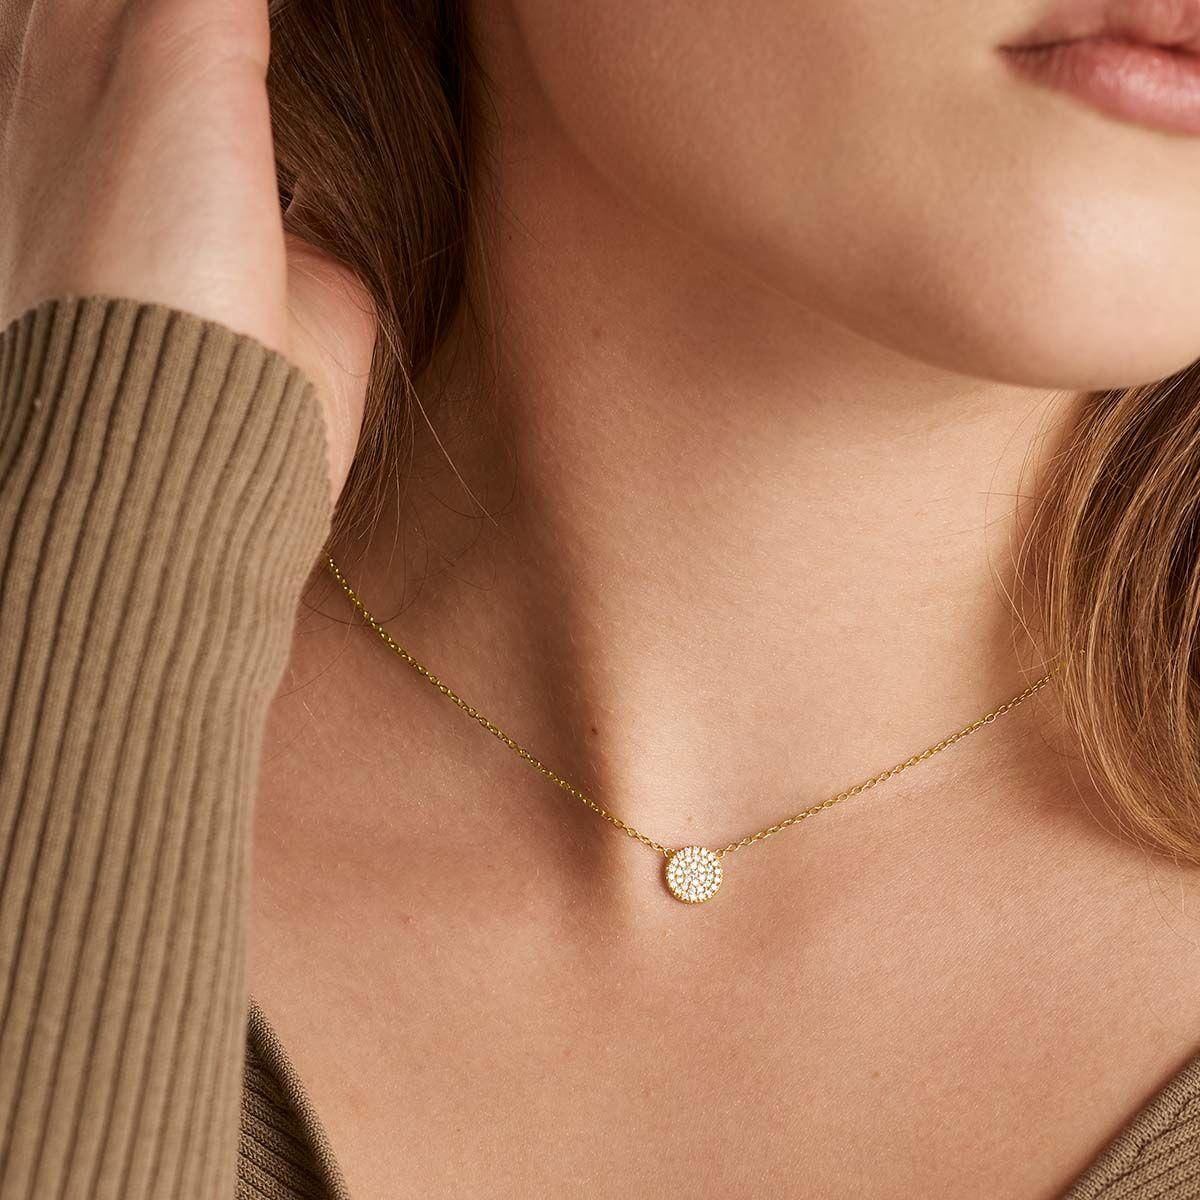 Lana - Halsketten - 18k vergoldet